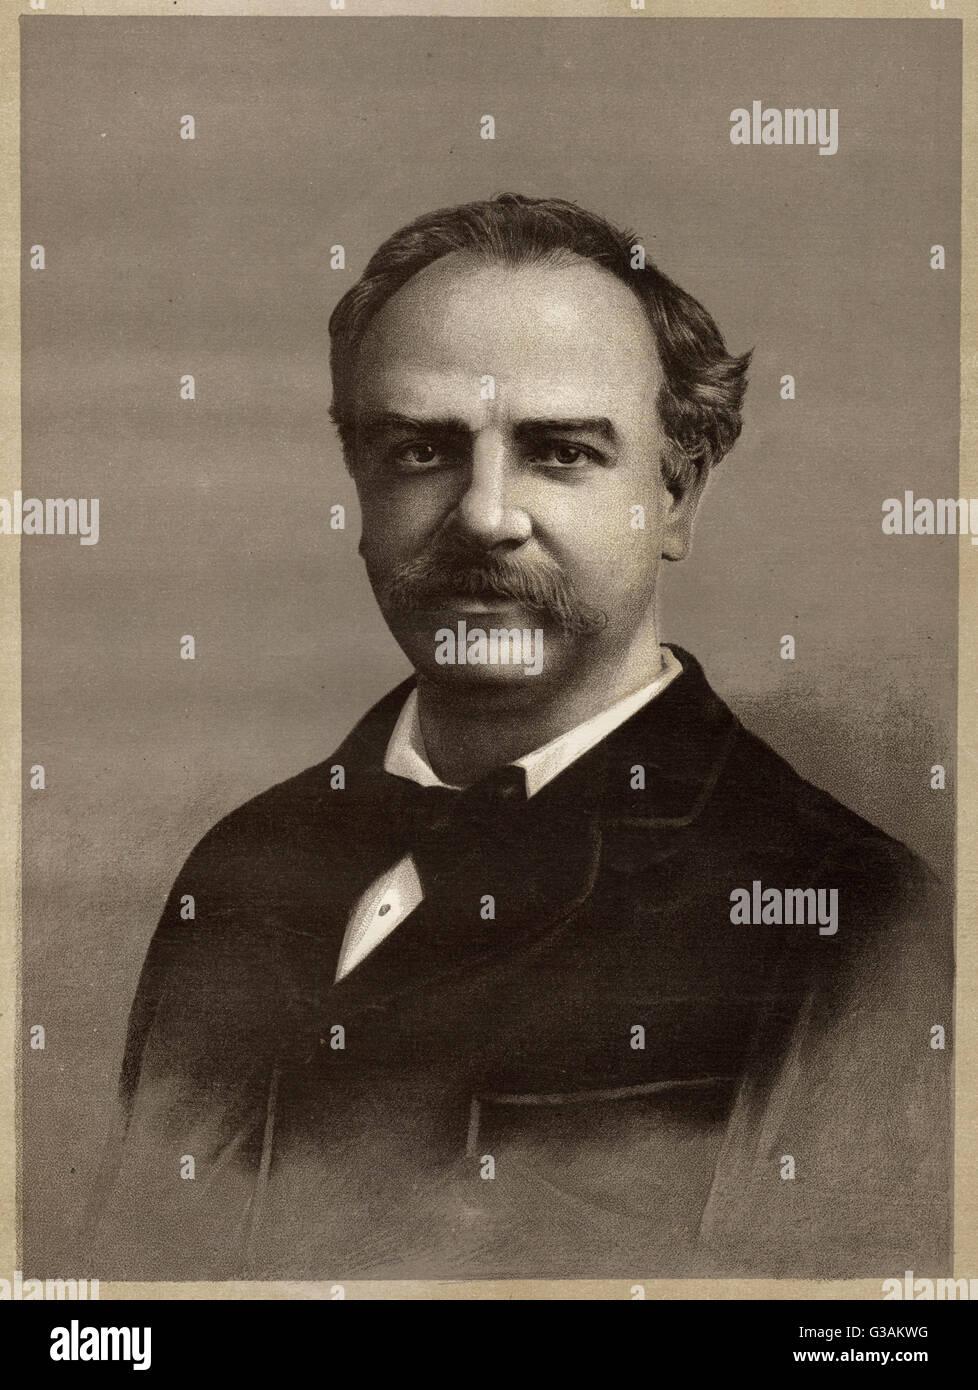 Sir Charles Santley (1834 - 1922), English opera and oratorio singer - Stock Image